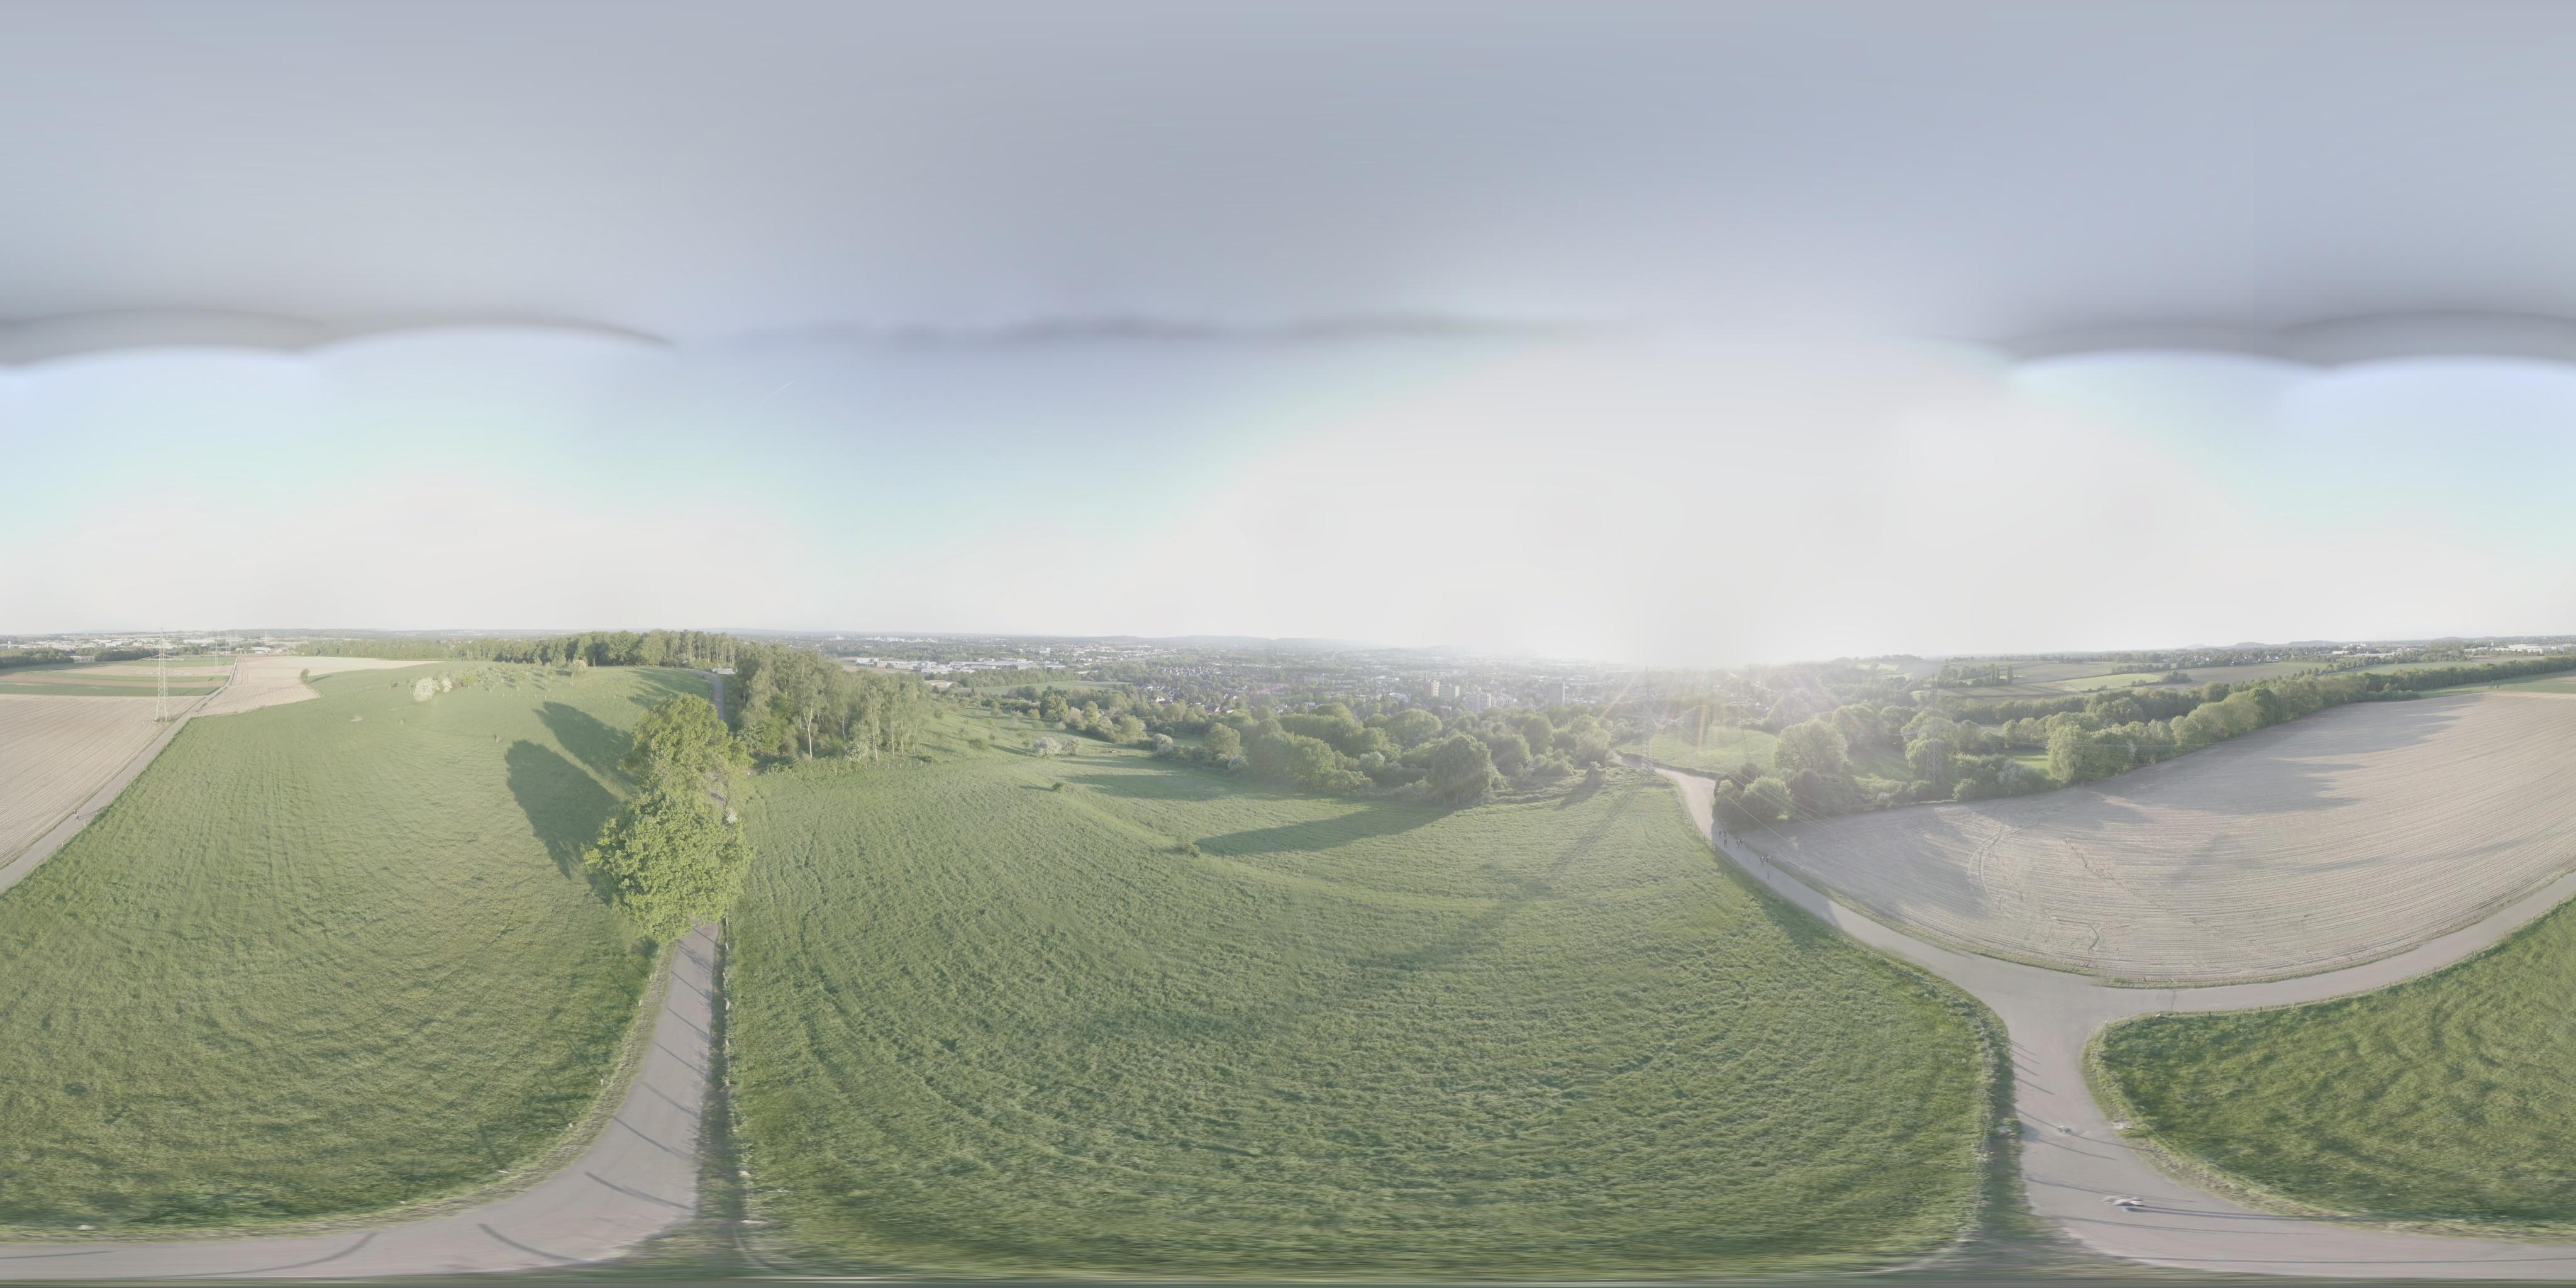 Capturing panorama images with DJI Go app - My Blog